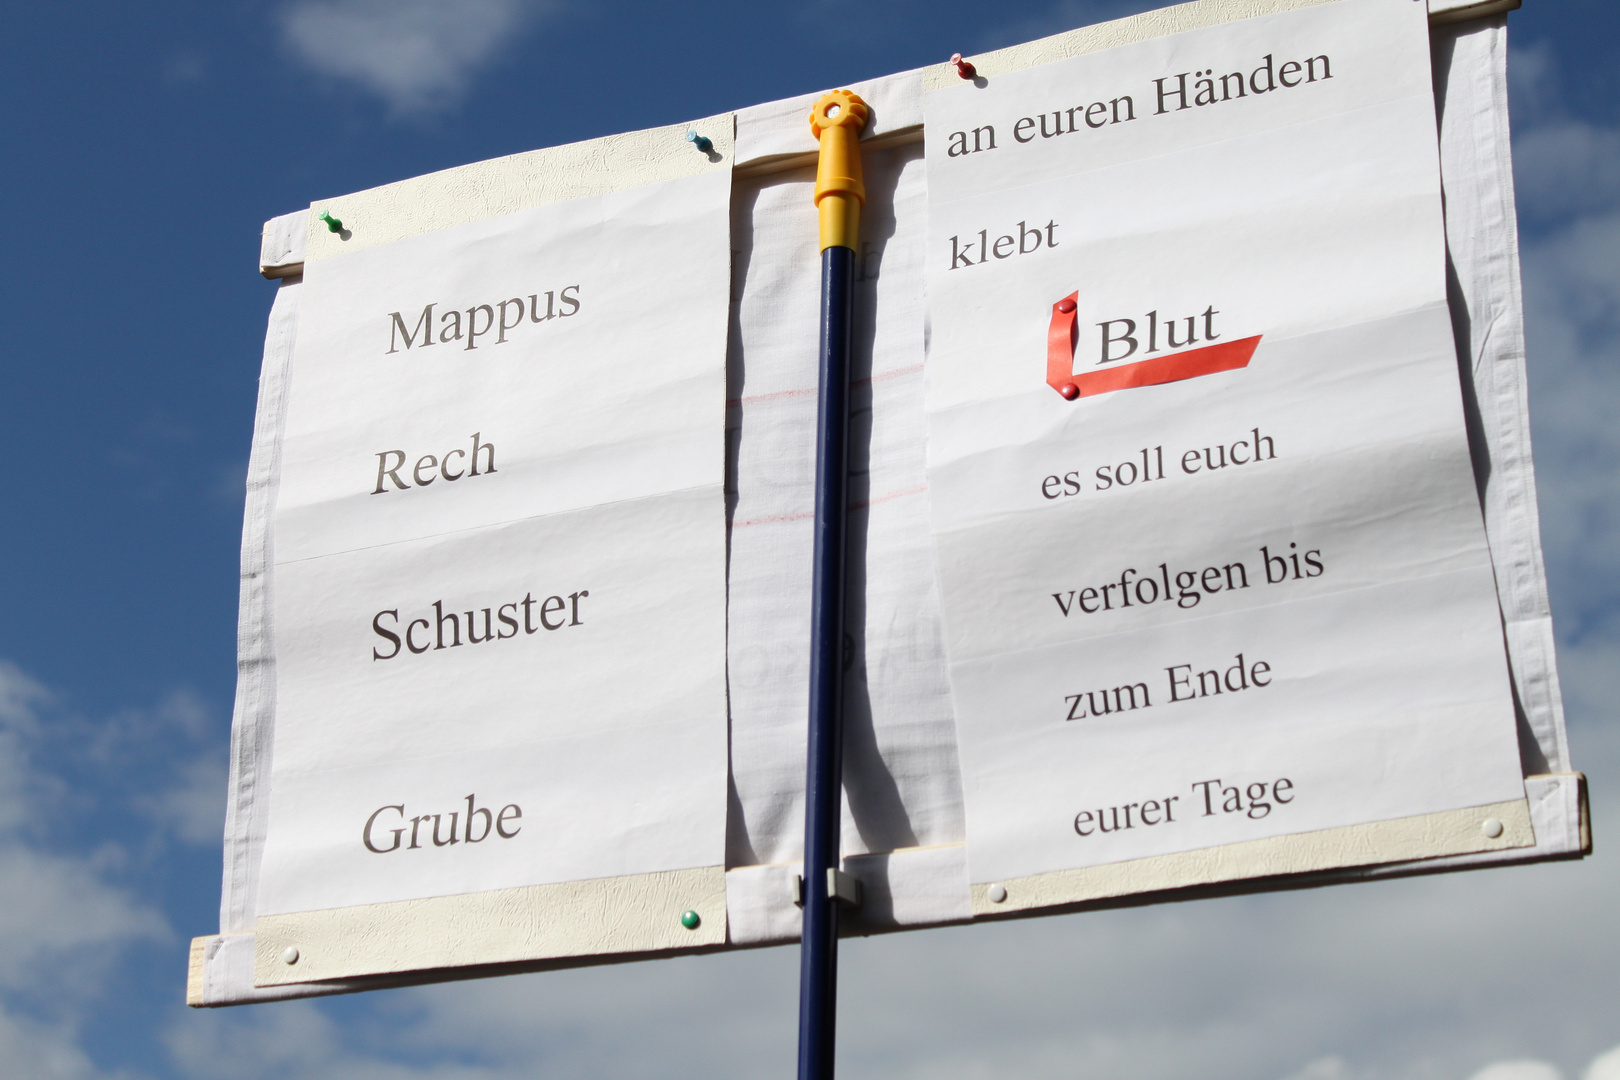 Plakat: Blut klebt ...am Bauzaun im Park in Stuttgart -K21 1.10.2010